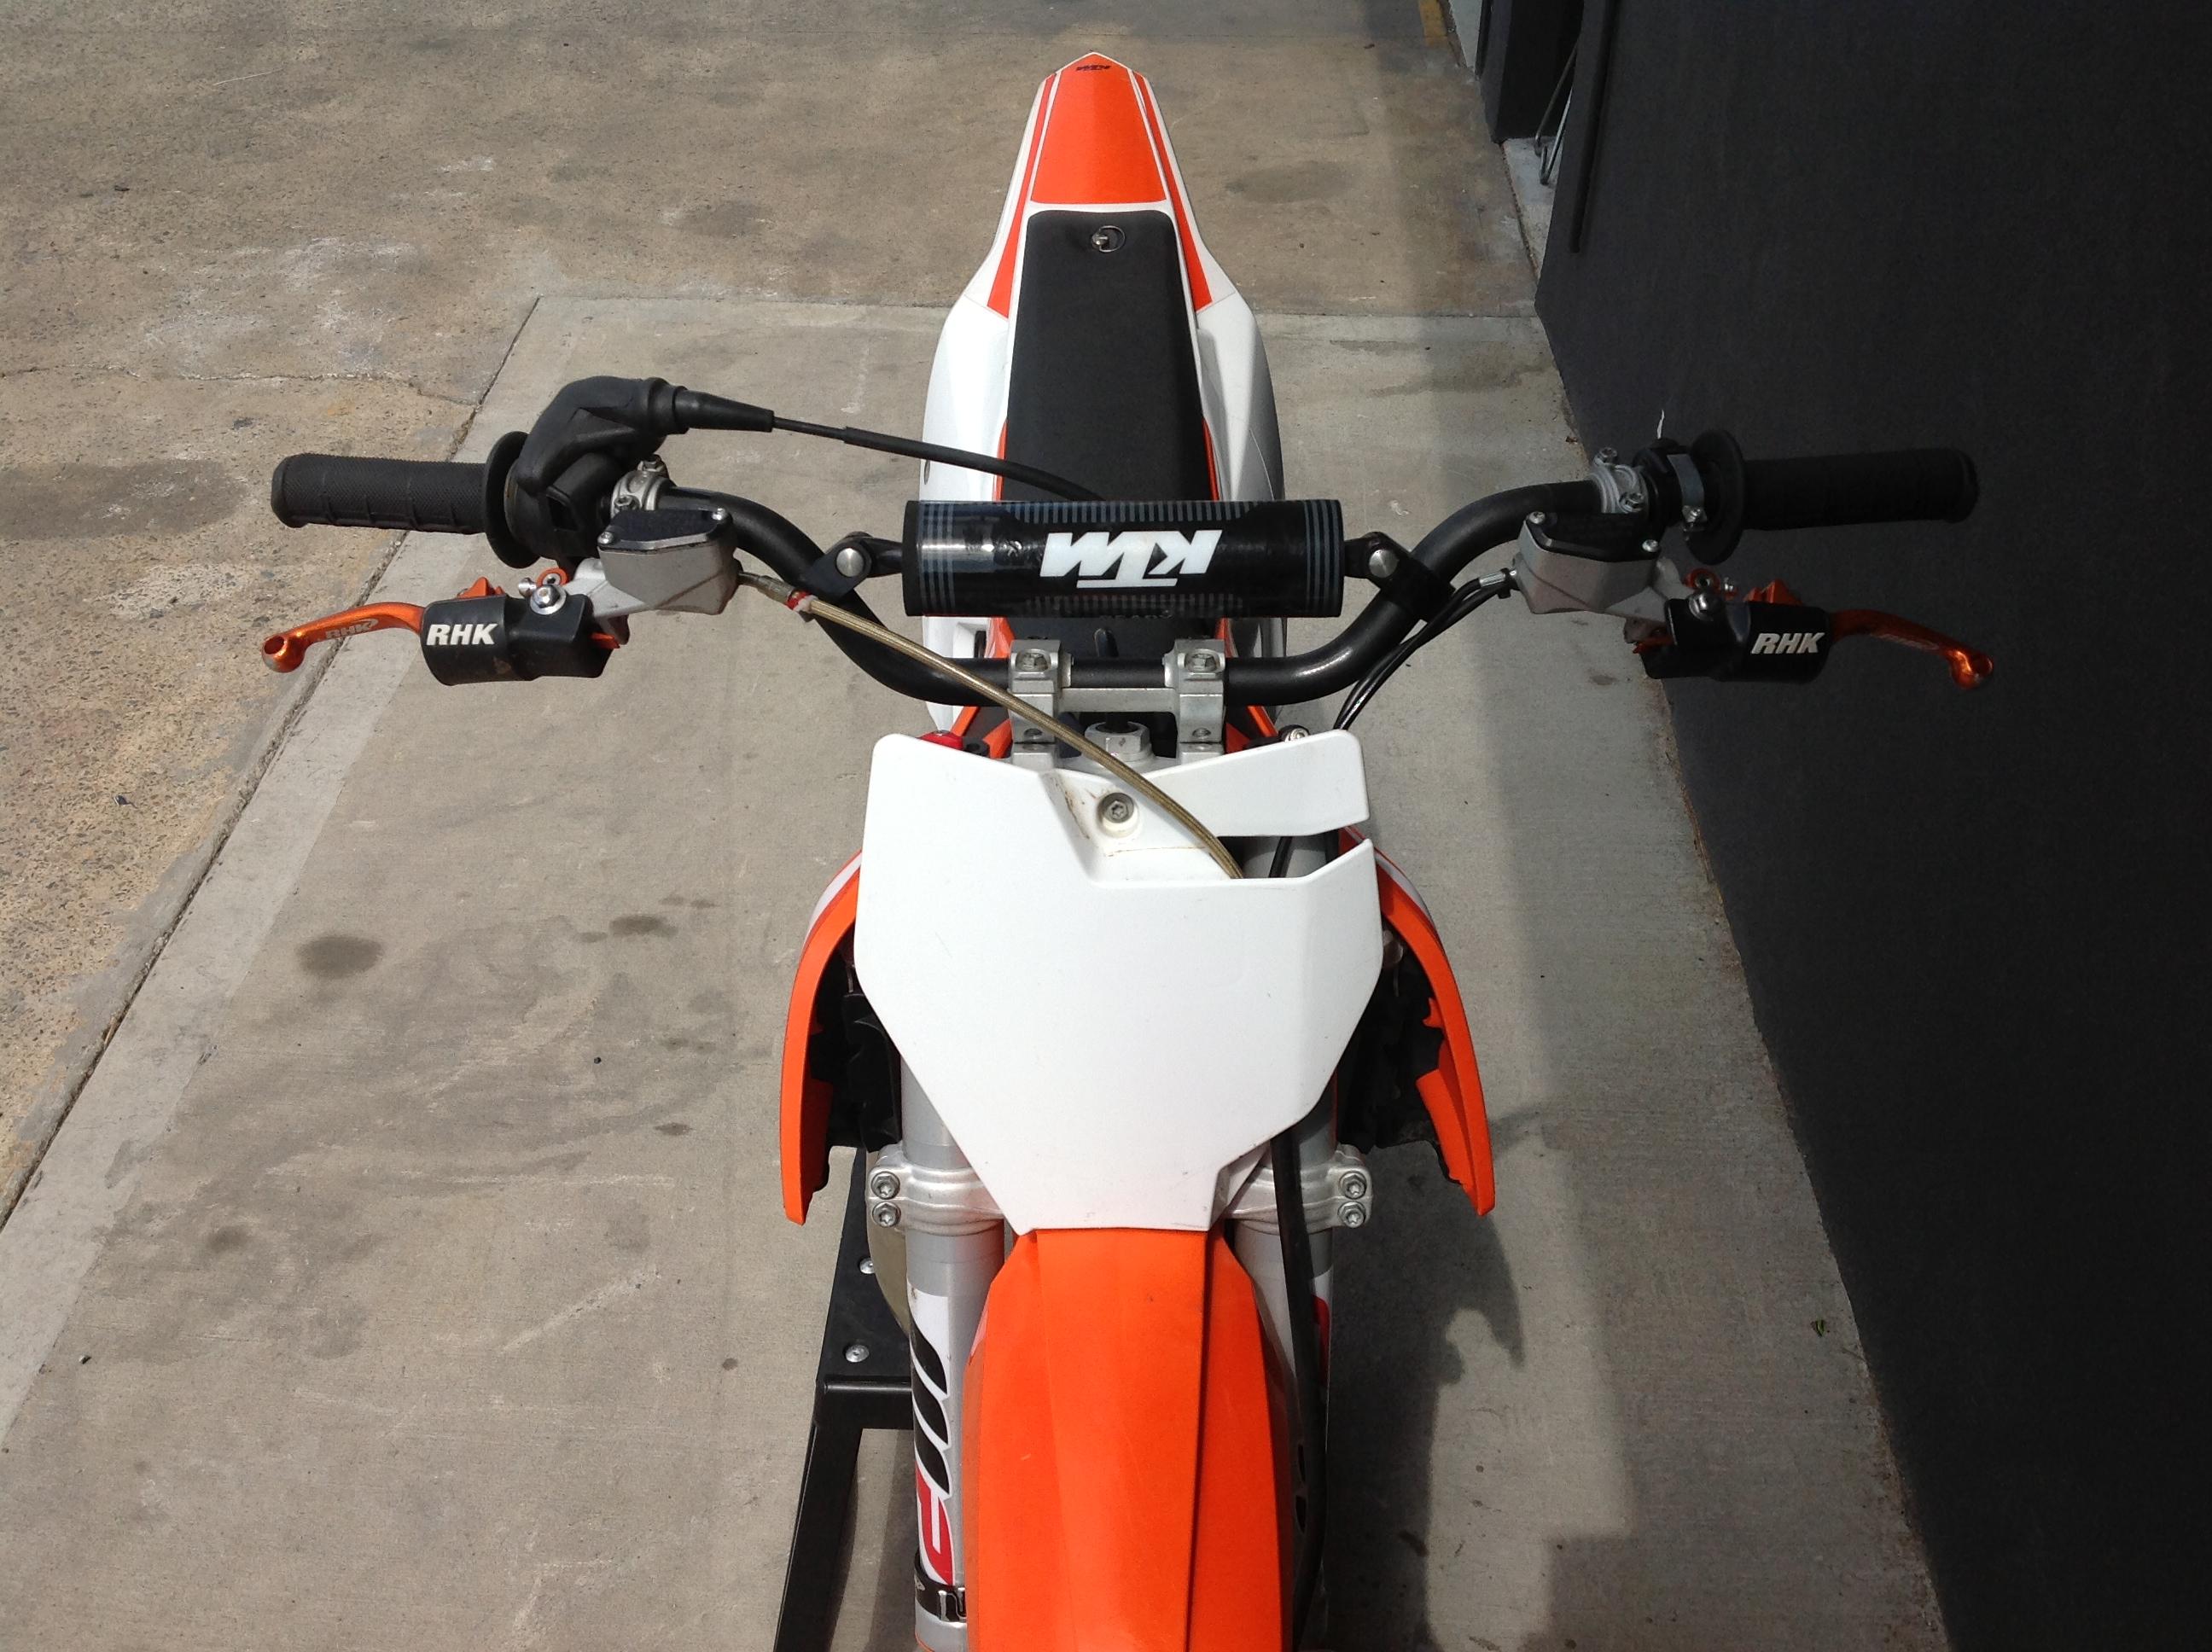 ... Array - 2018 ktm 65 sx 65 sx mini bike manual 6sp 65cc excite  motorsports rh Array - service ...